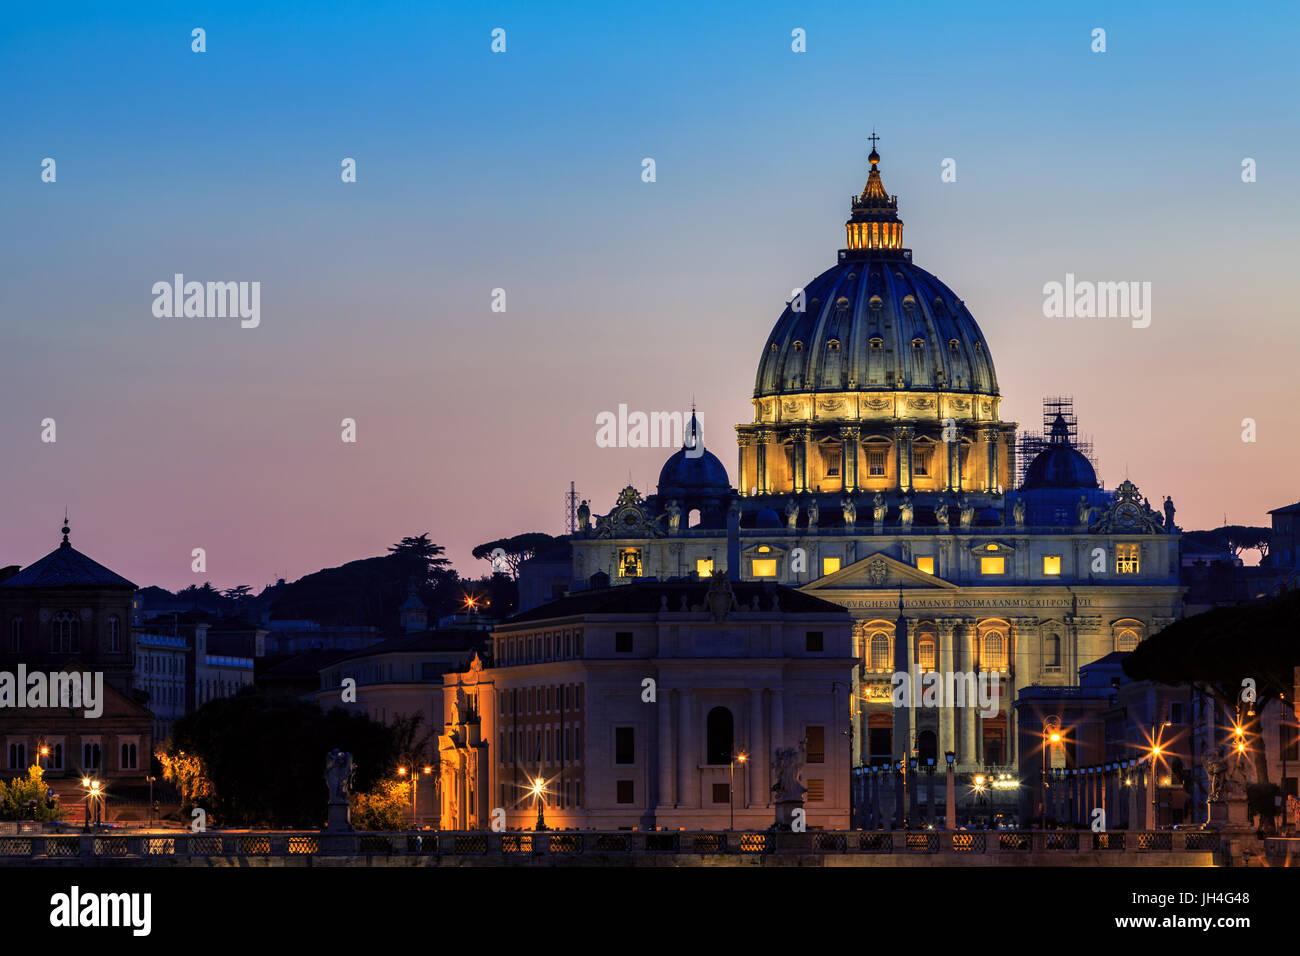 Saint Peter's Basilica at sunset, Rome, Italy - Stock Image